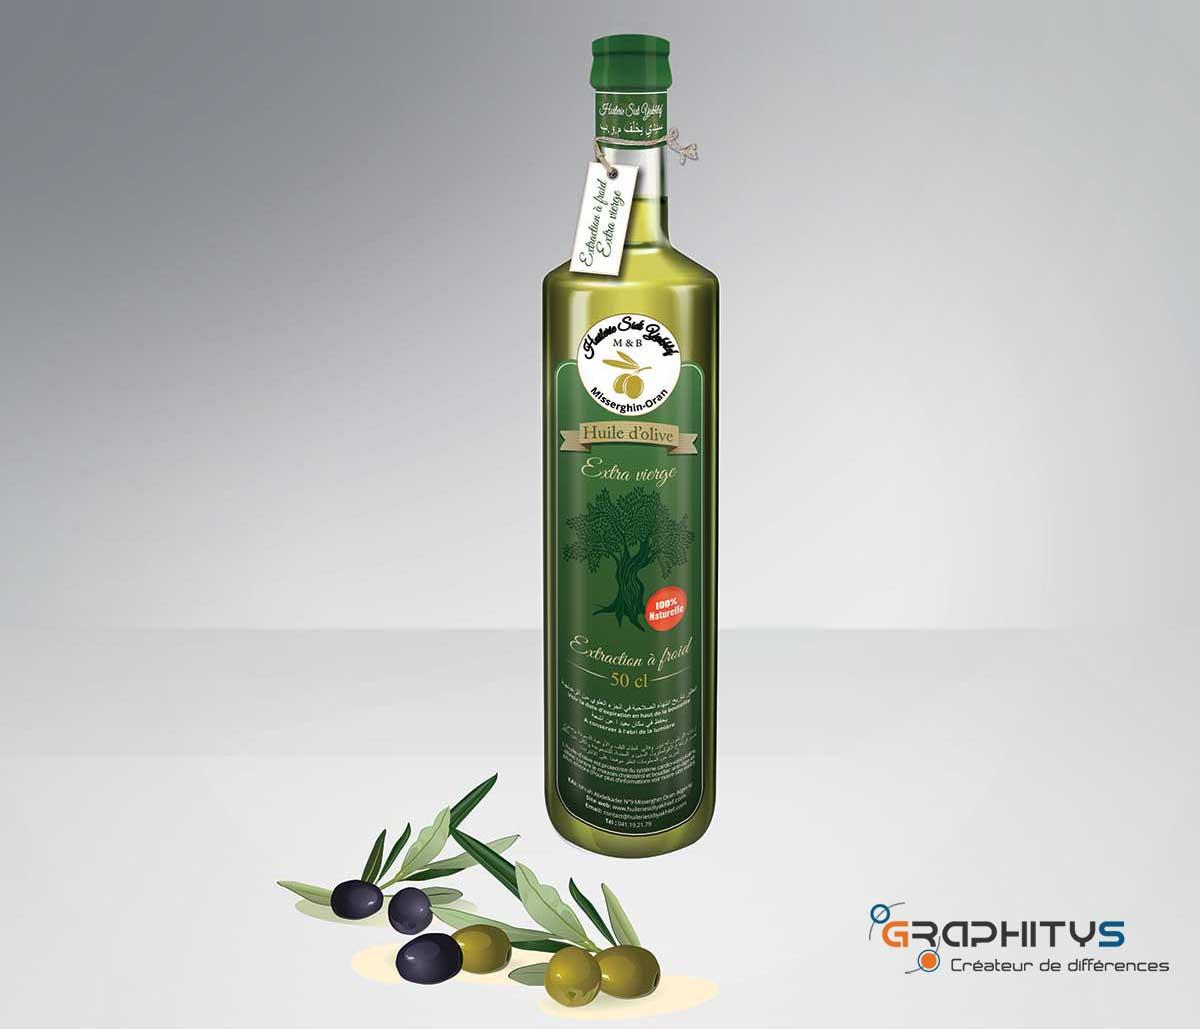 Bouteille d'huile d'olive Huilerie sidi yakhlef